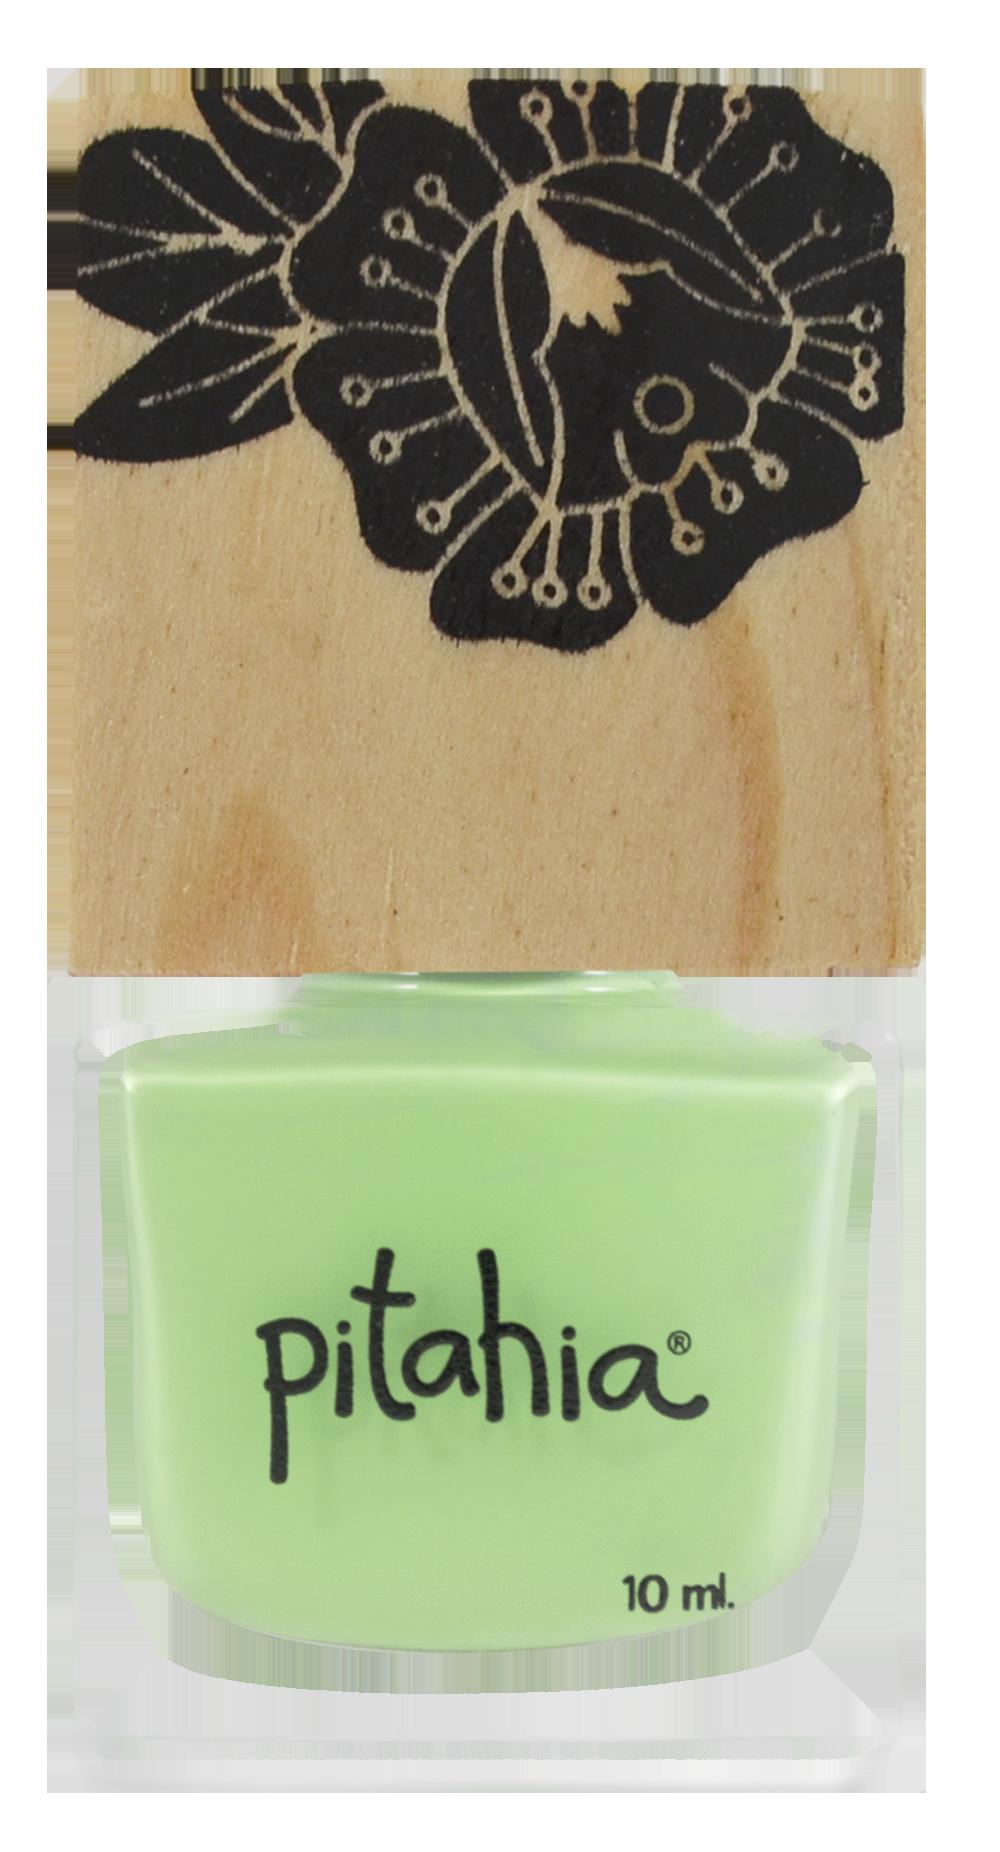 Lo Nuevo | Pitahia